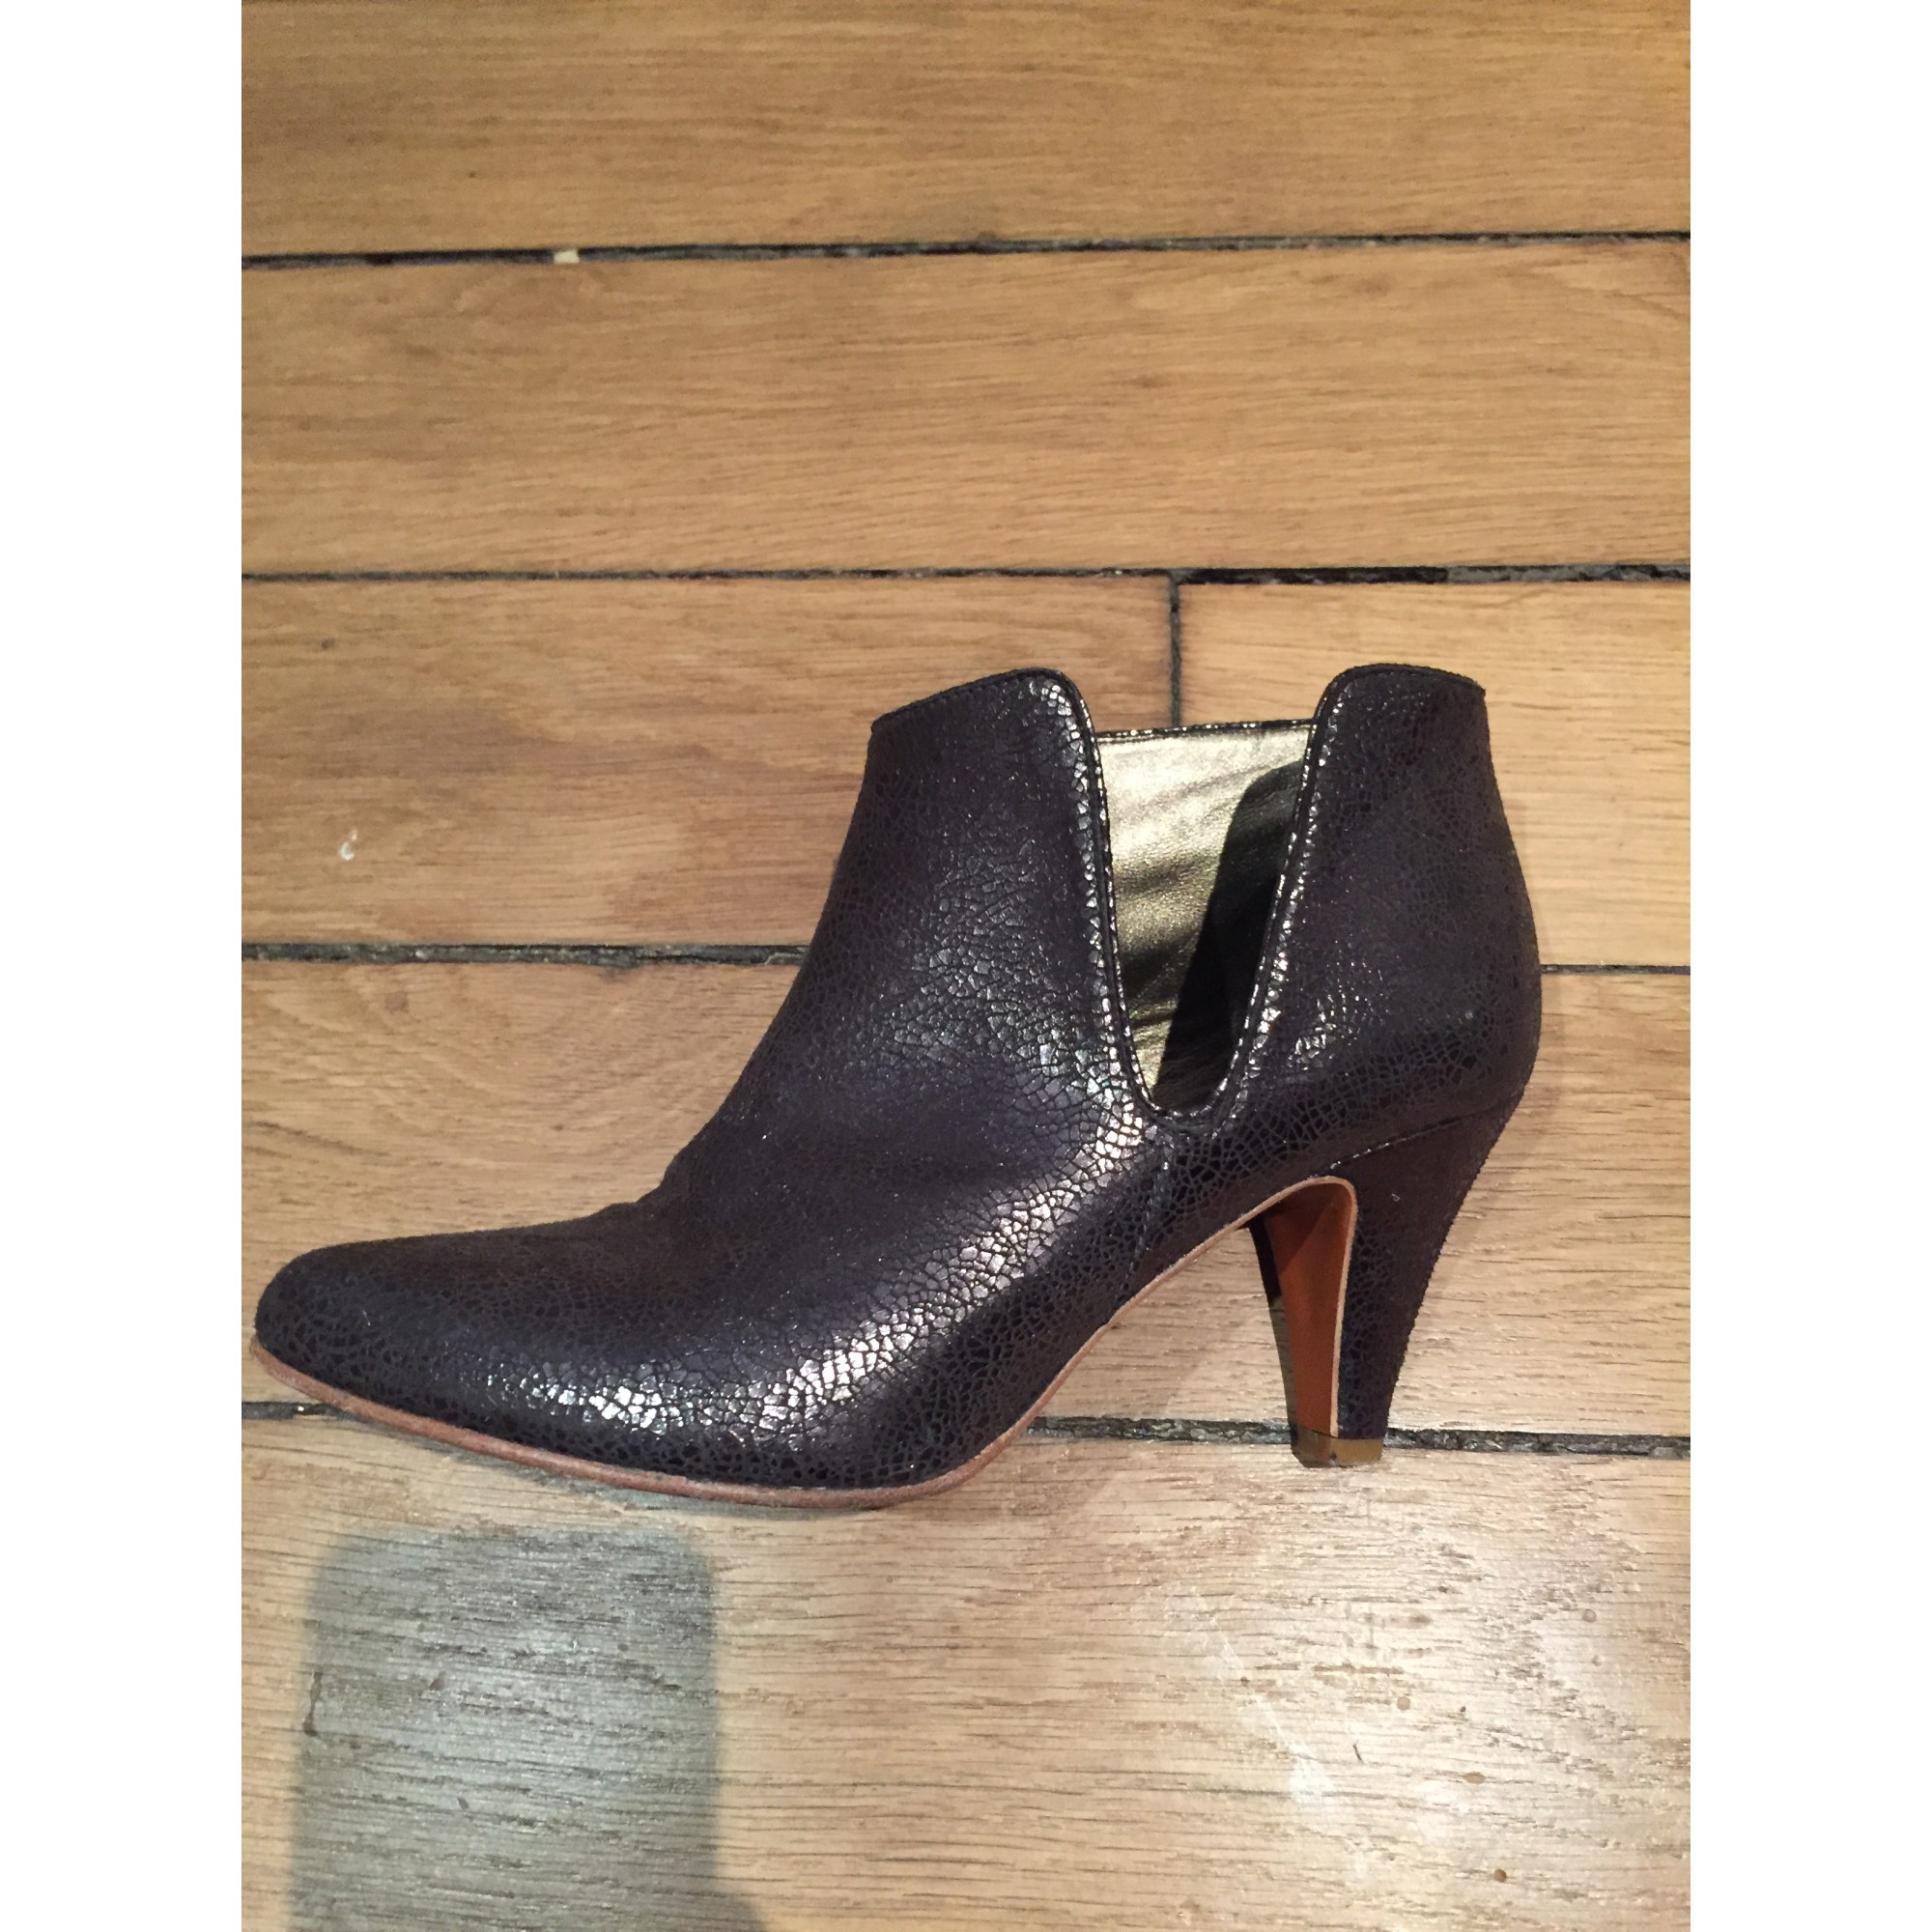 Bottines & low boots plates ADIGE cuir marron 36 MvVgJX8Uy